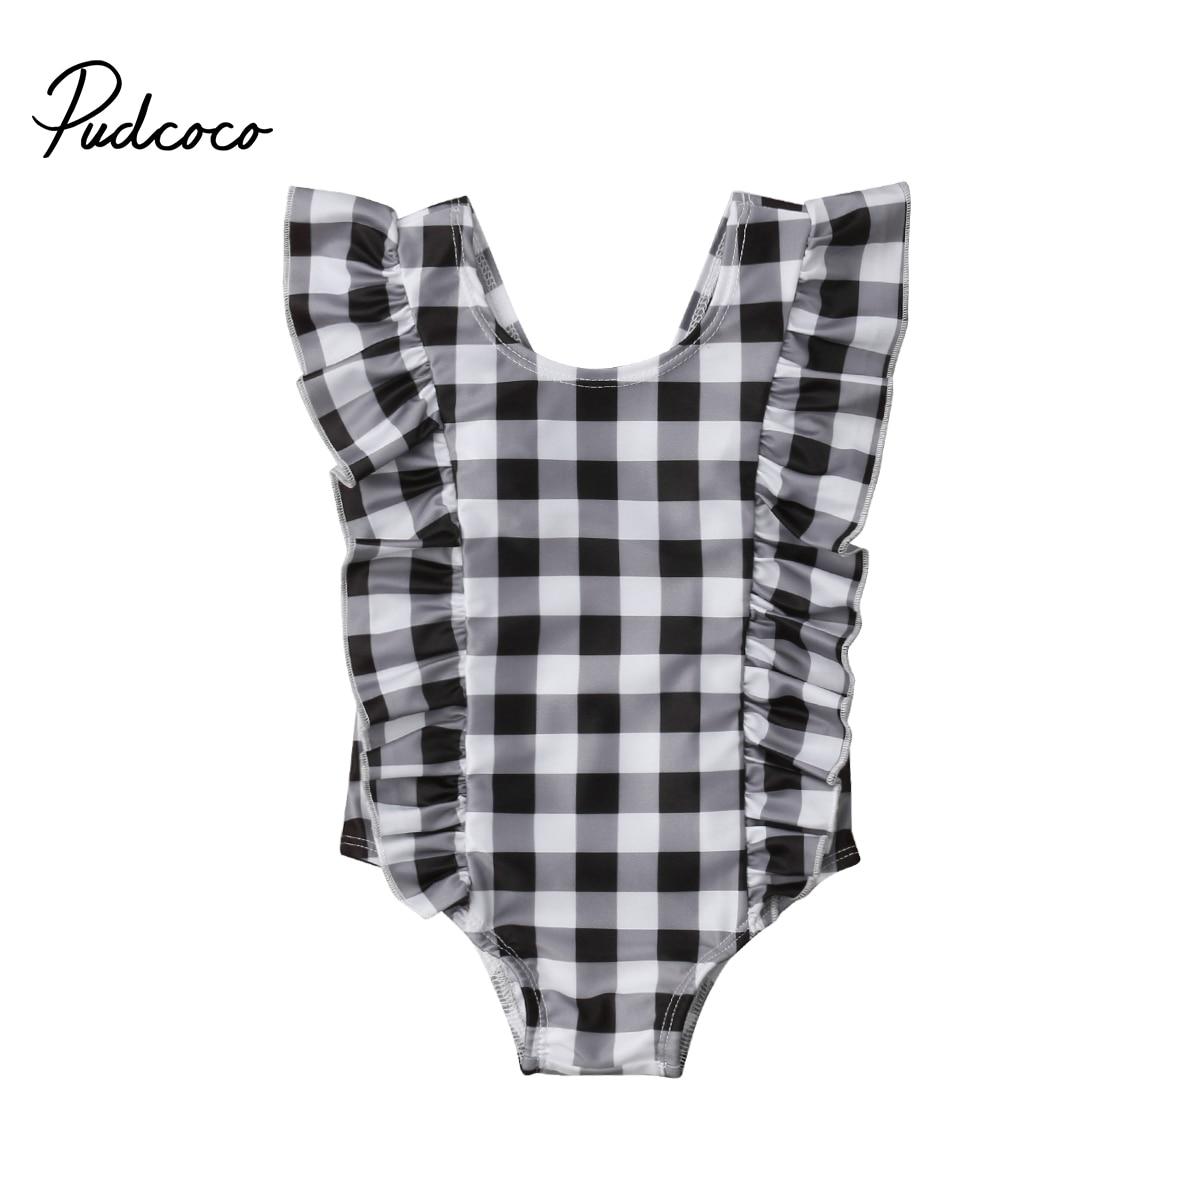 0-24M Kid Swimsuit Surf Suit Swimwear Infant Baby Girl Ruffle Plaid Romper Jumpsuit